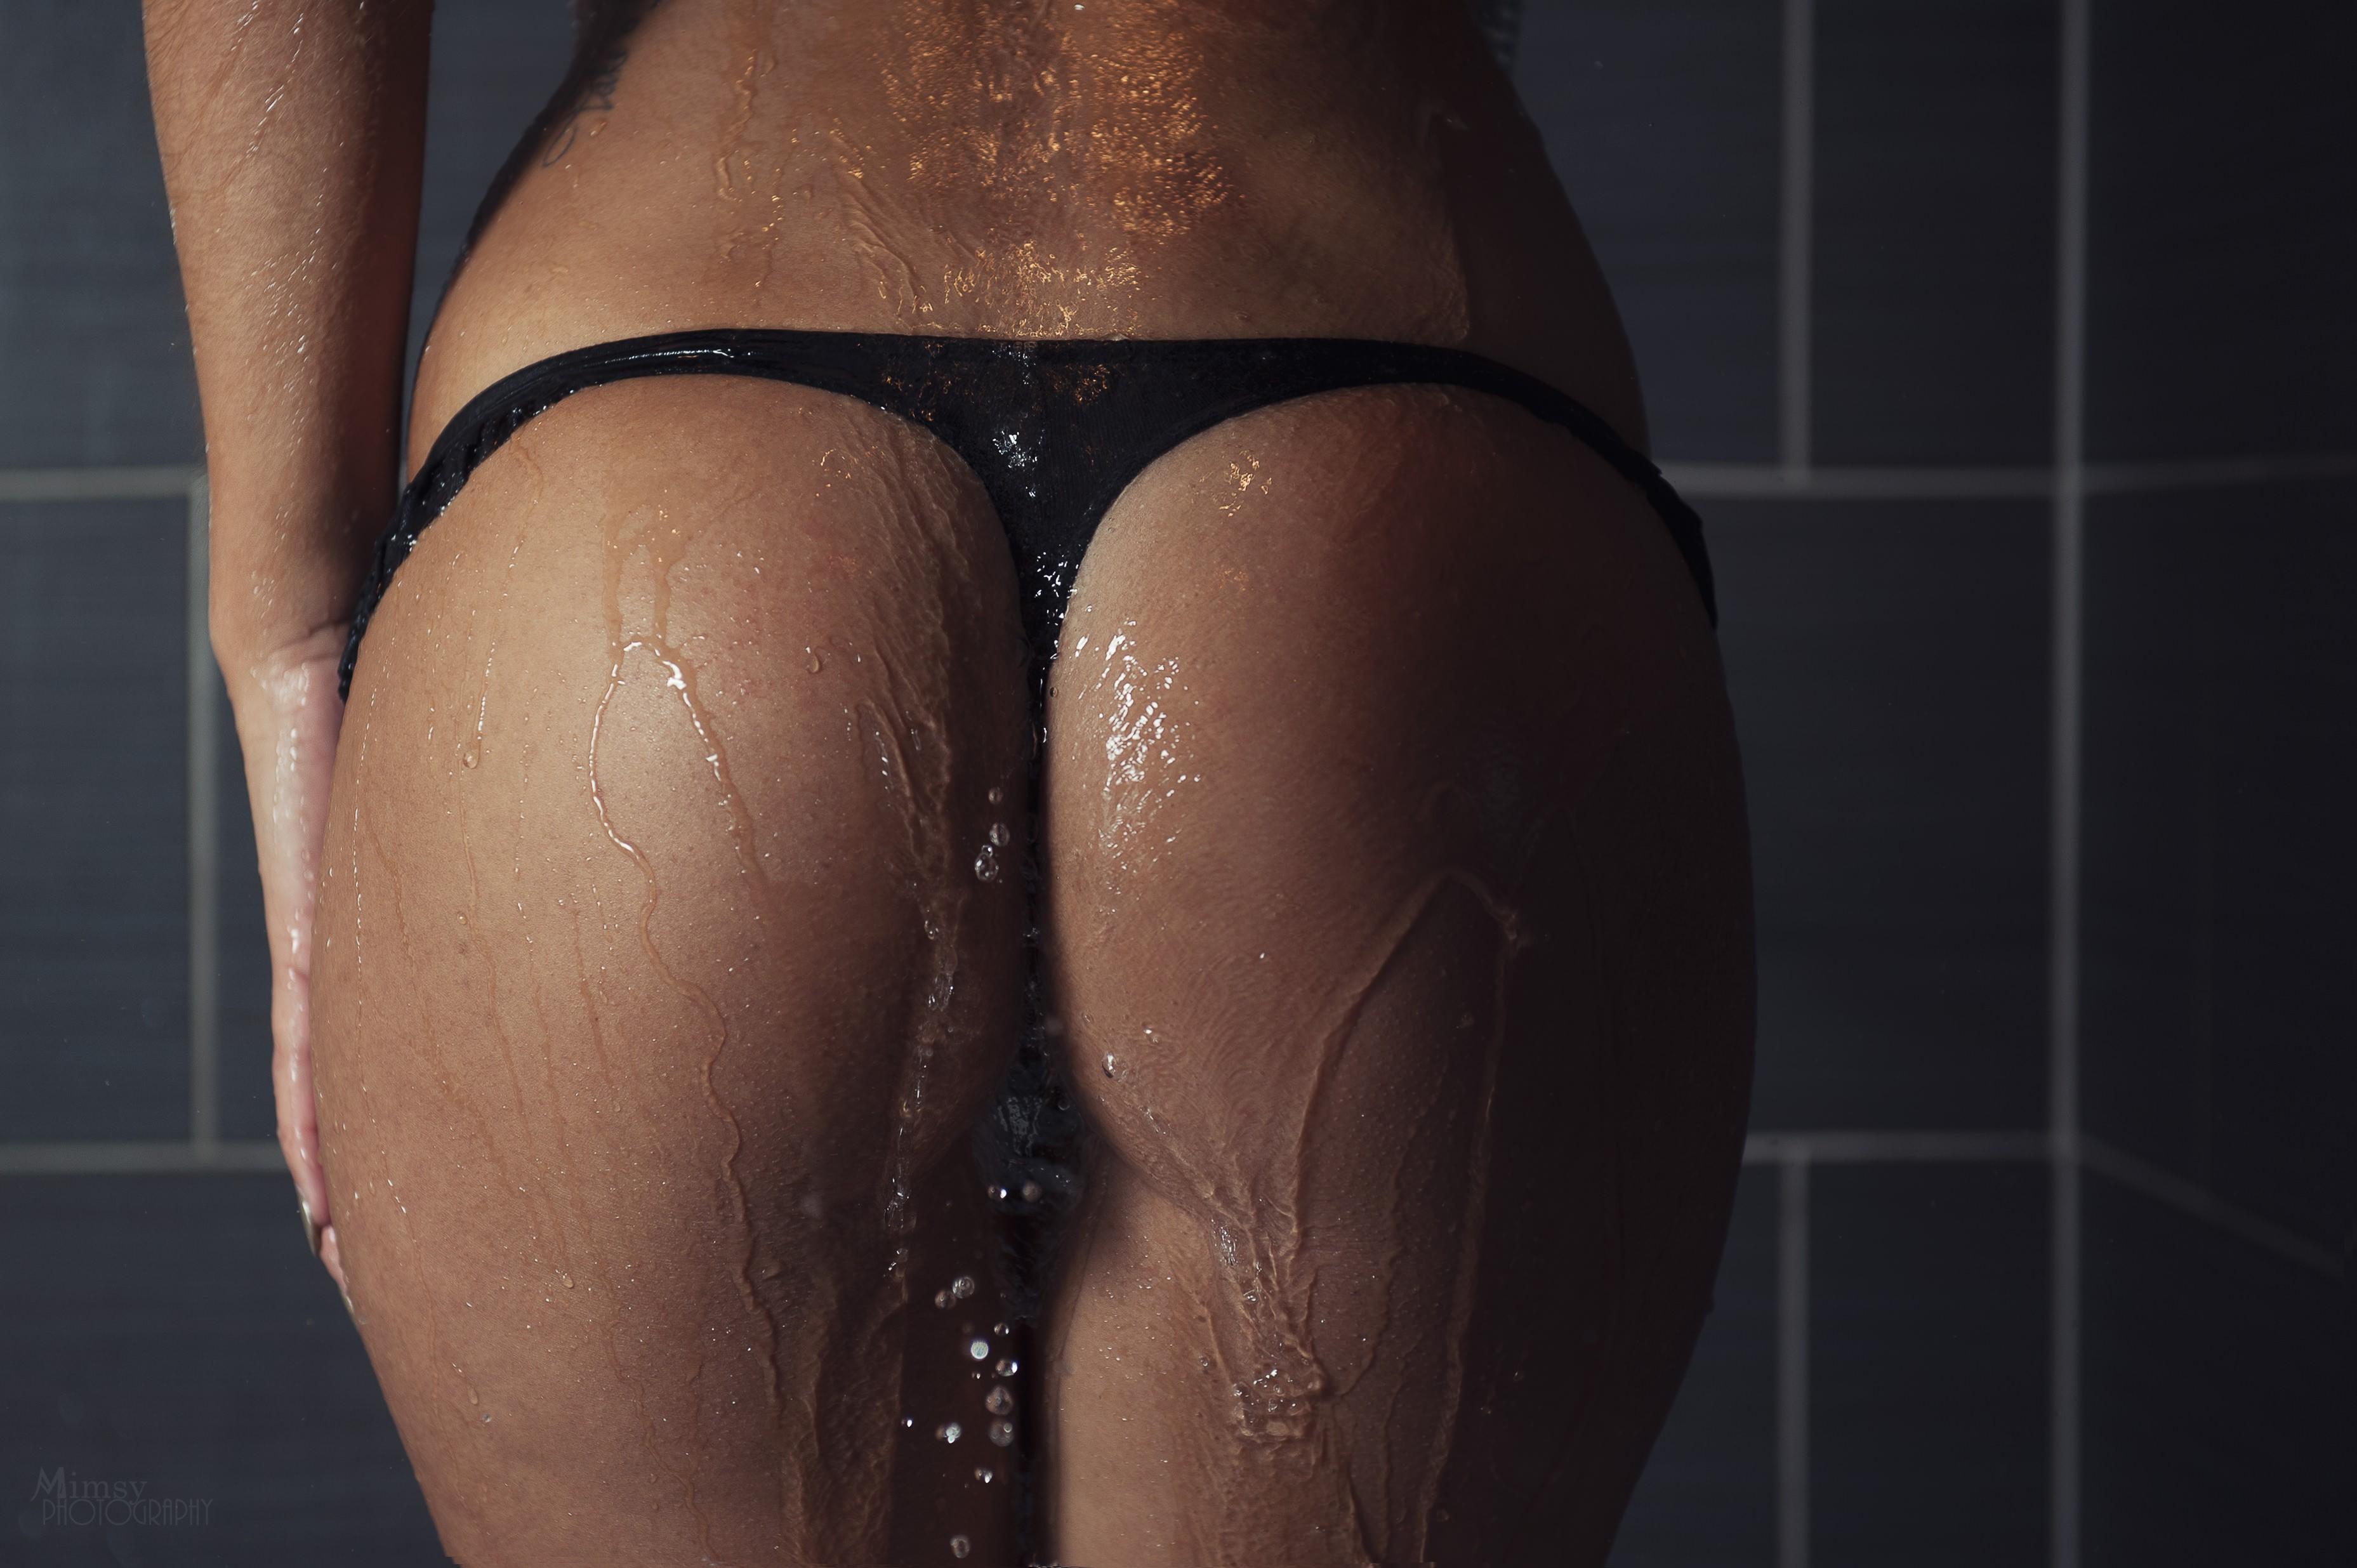 Wallpapers with girls in wet panties